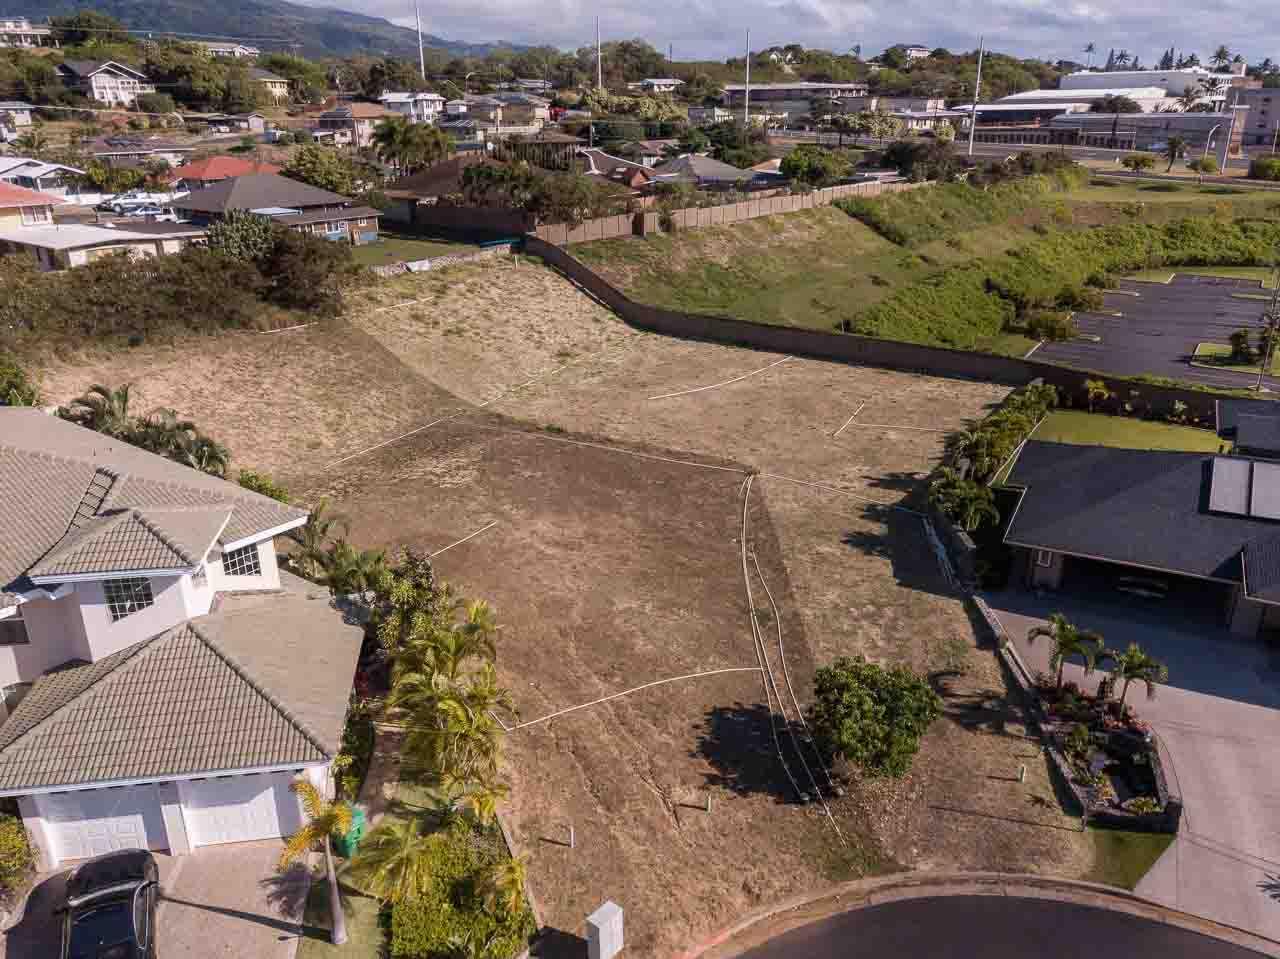 68 Keoneloa St  Wailuku, Hi 96793 vacant land - photo 14 of 15